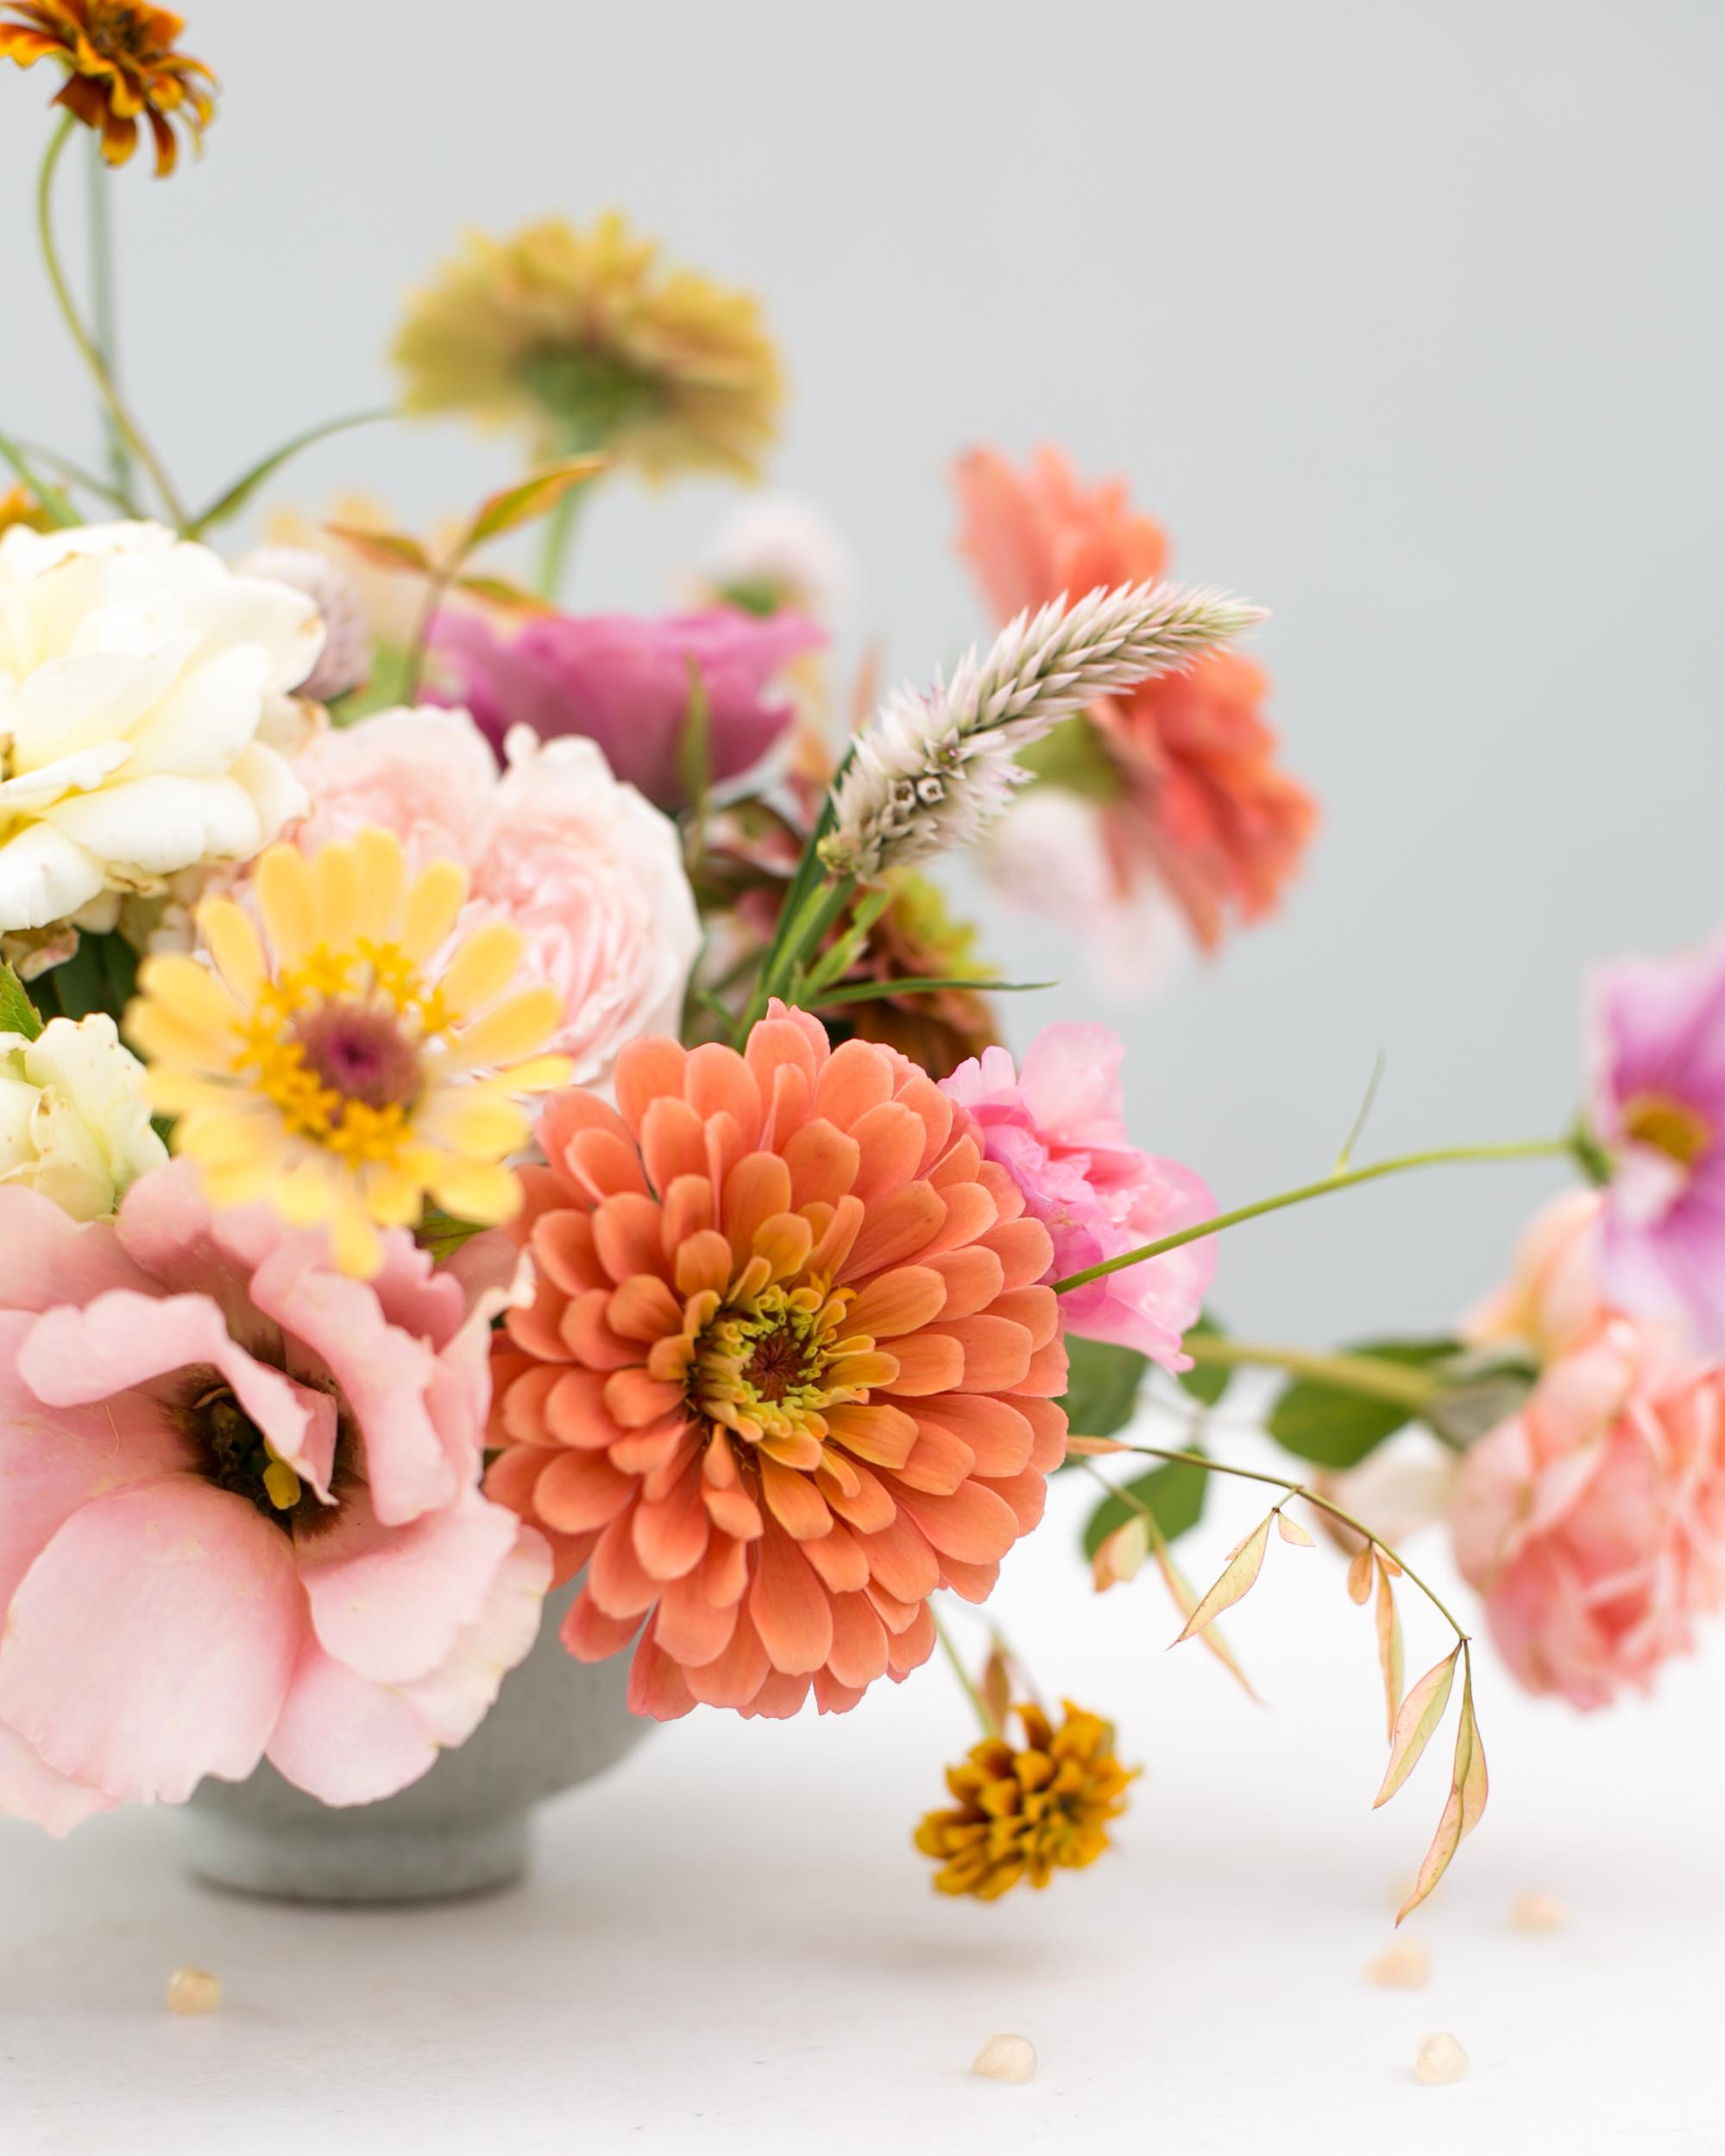 fallflowers-1.jpg